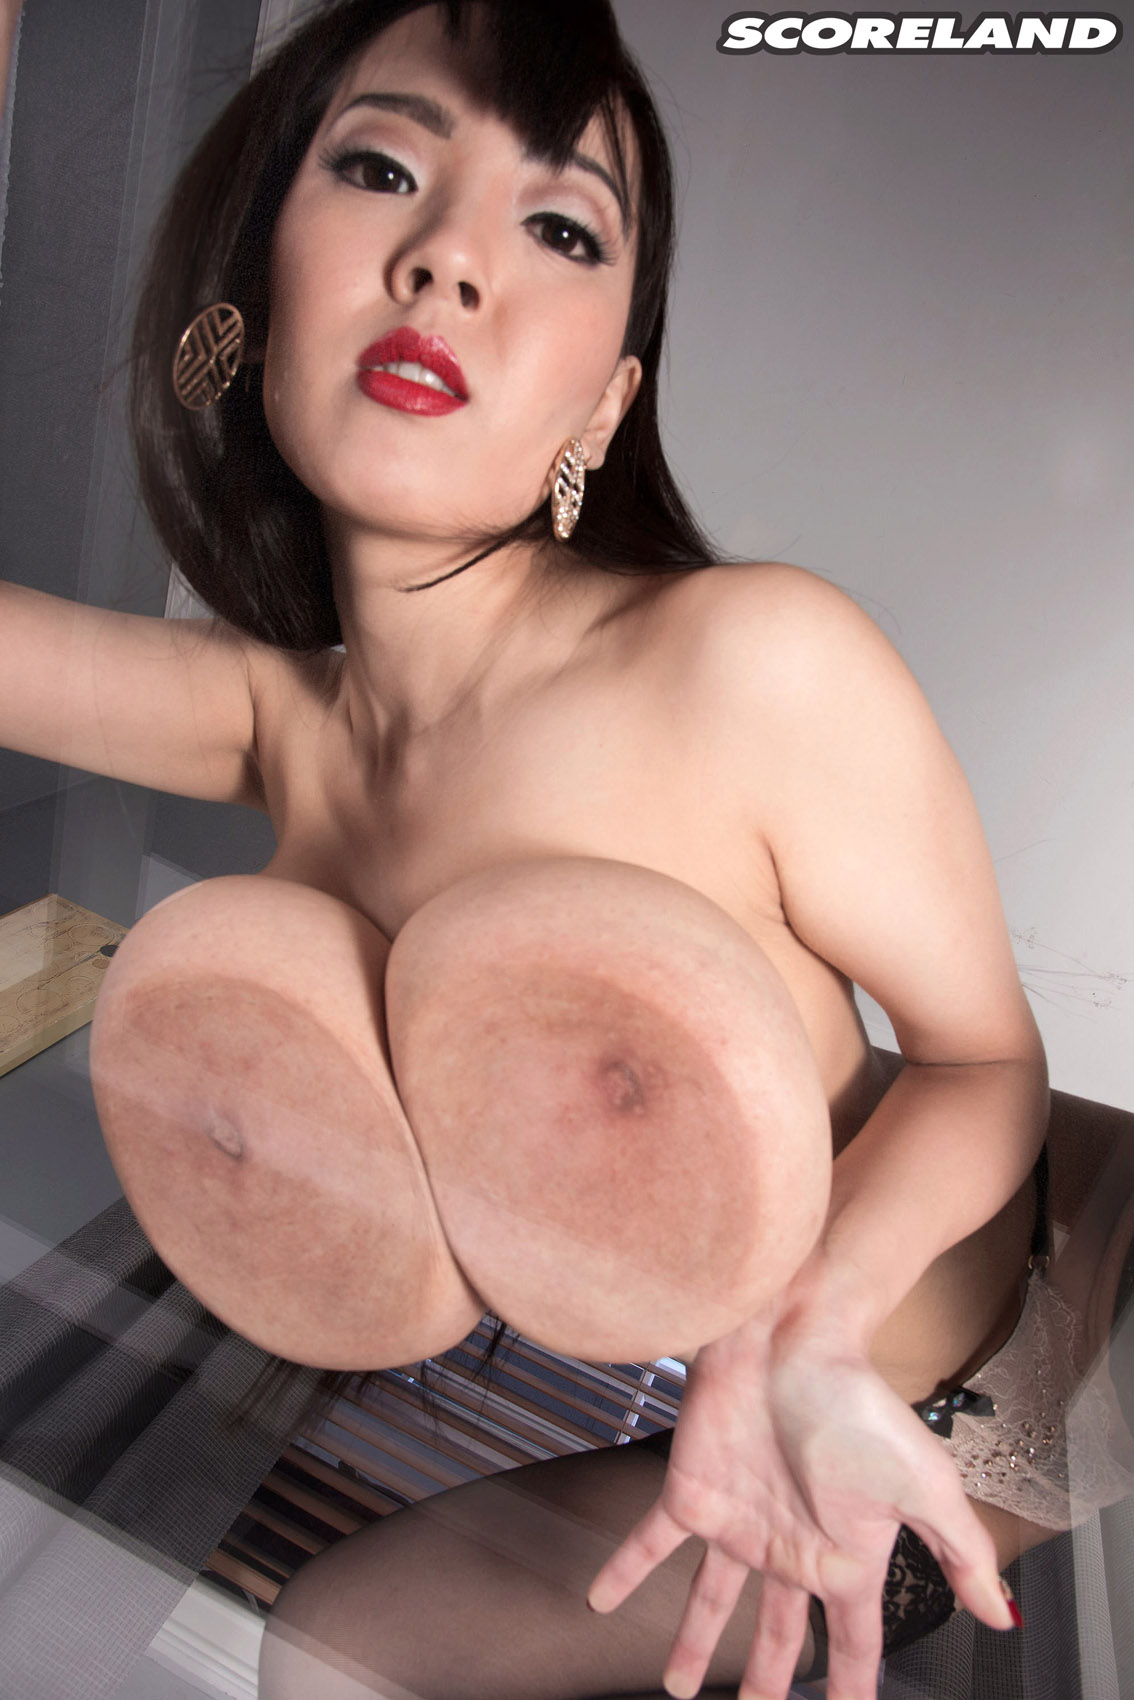 Hitomi Tanaka Lipstick And Lingerie - Curvy Erotic-1852